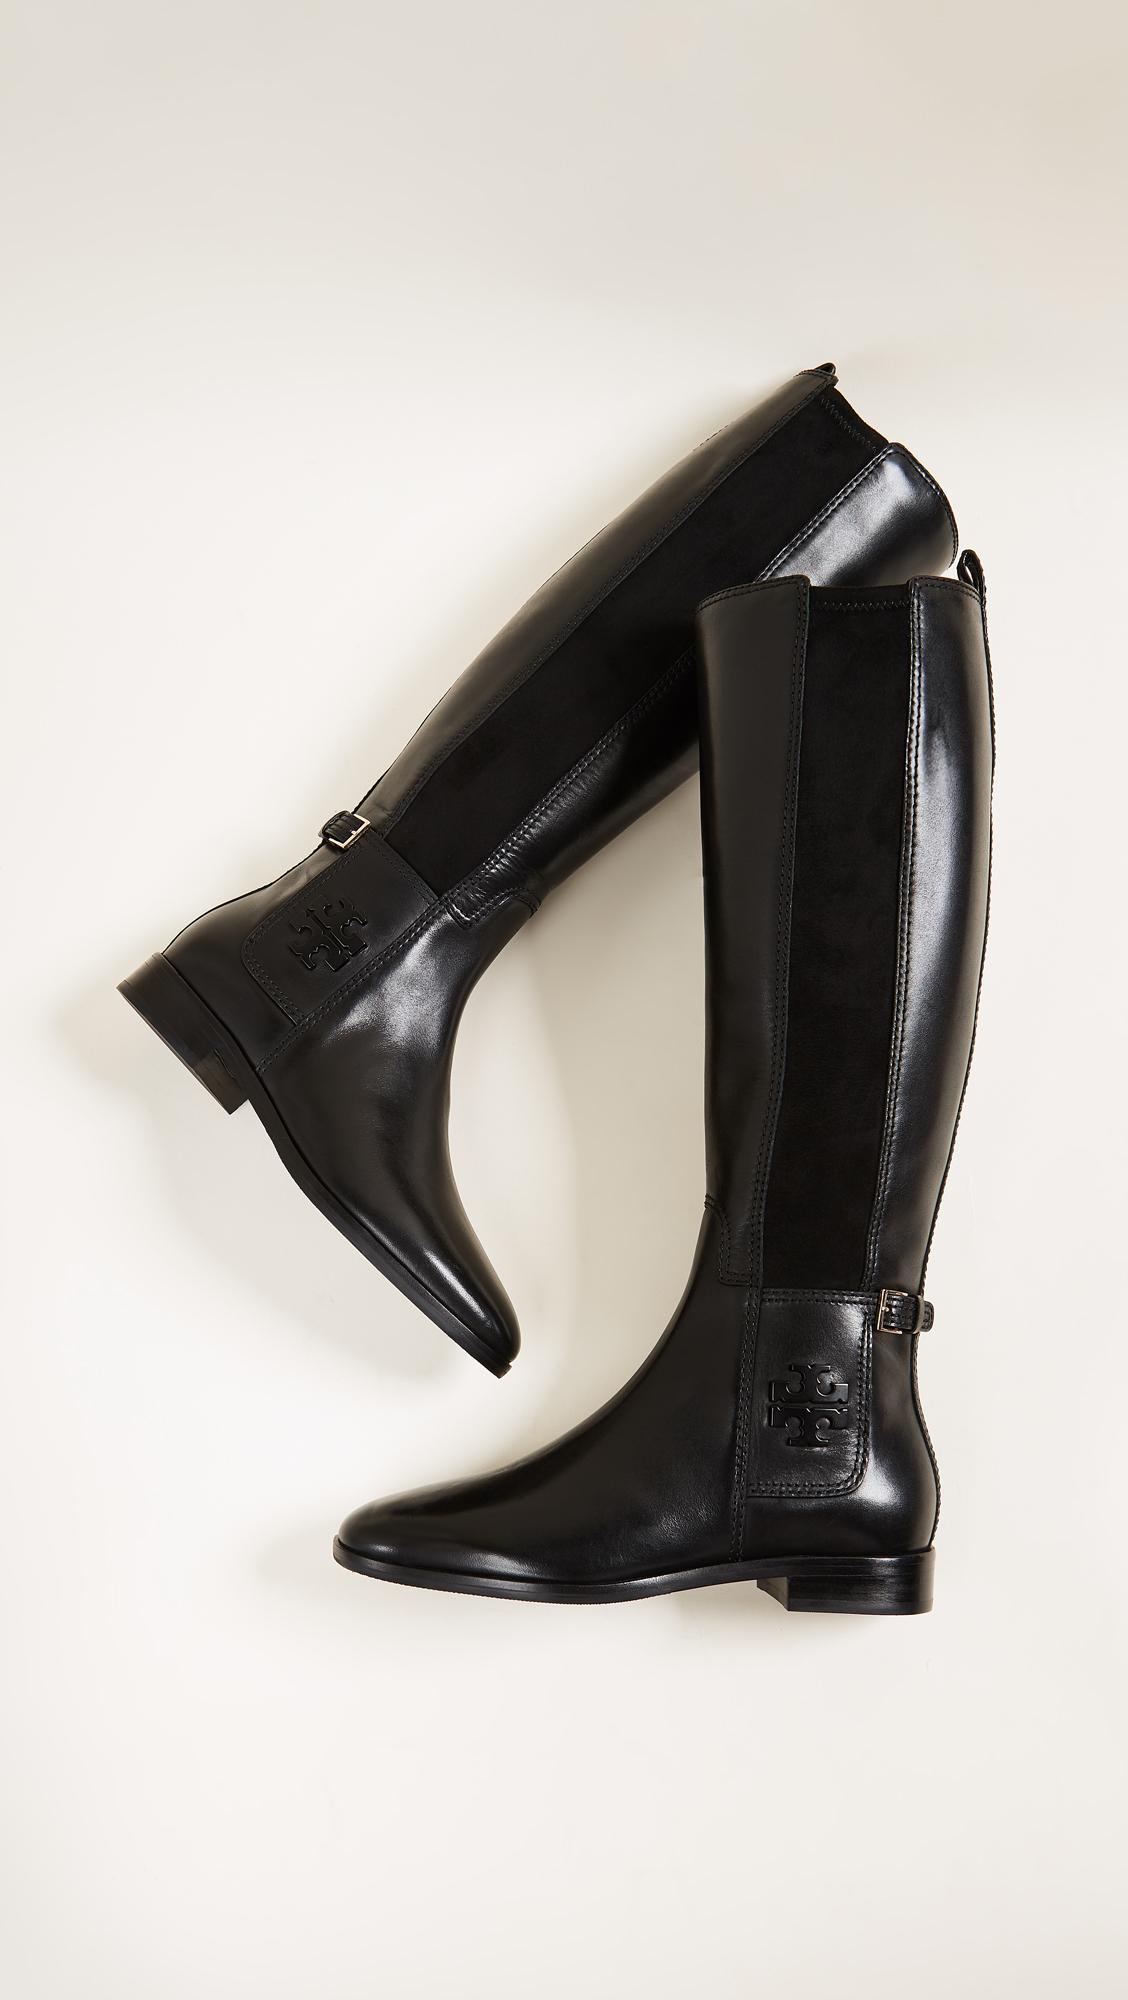 f709e32b880 Tory Burch Wyatt Boots